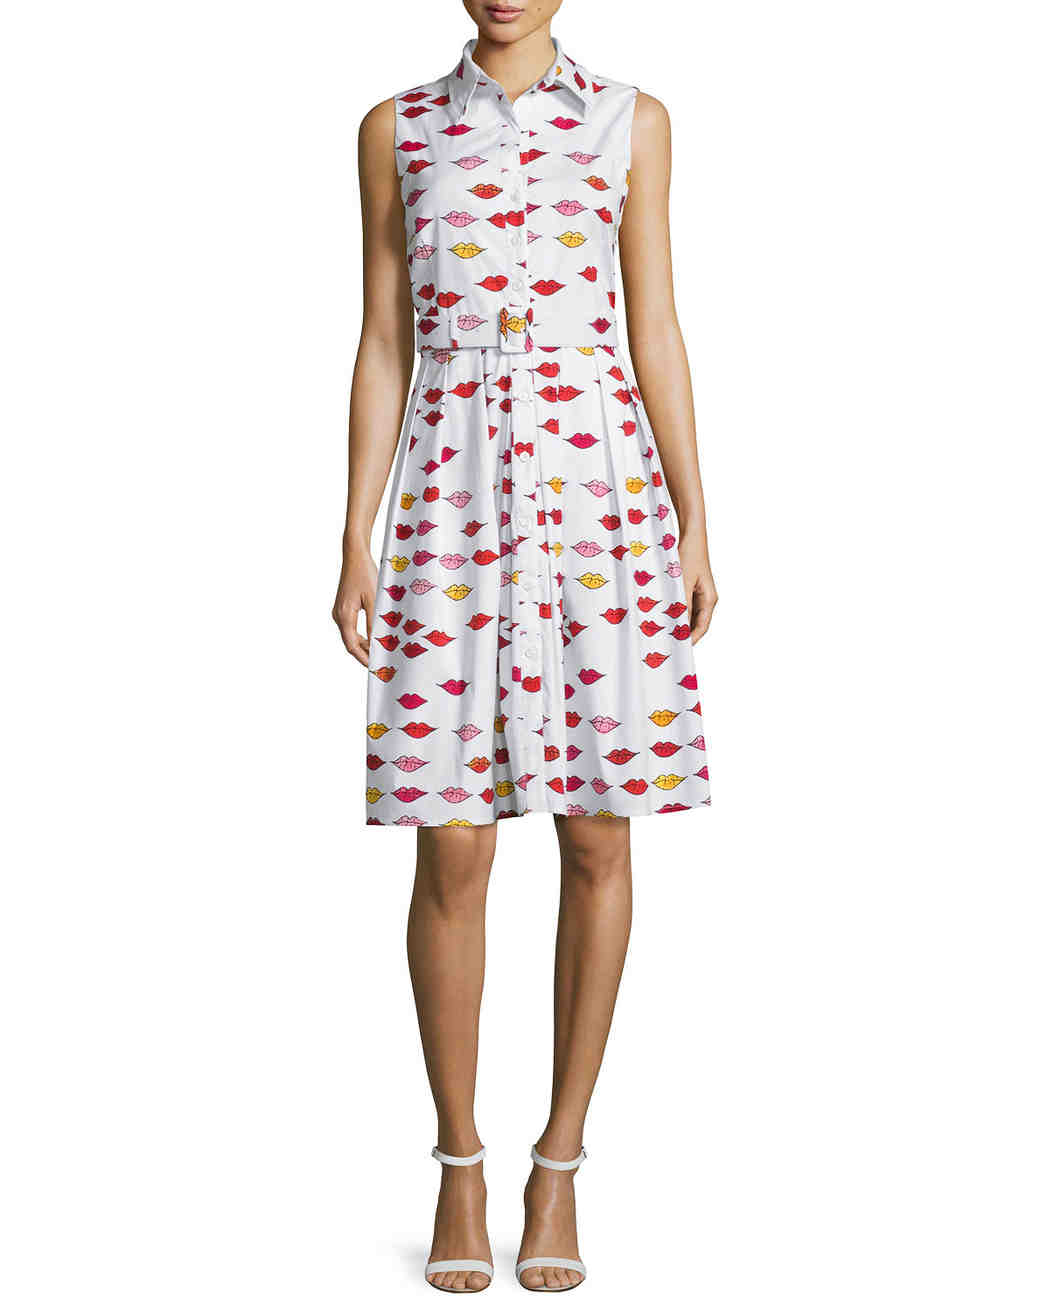 bridal-shower-dress-samantha-sung-shirtdress-0416.jpg